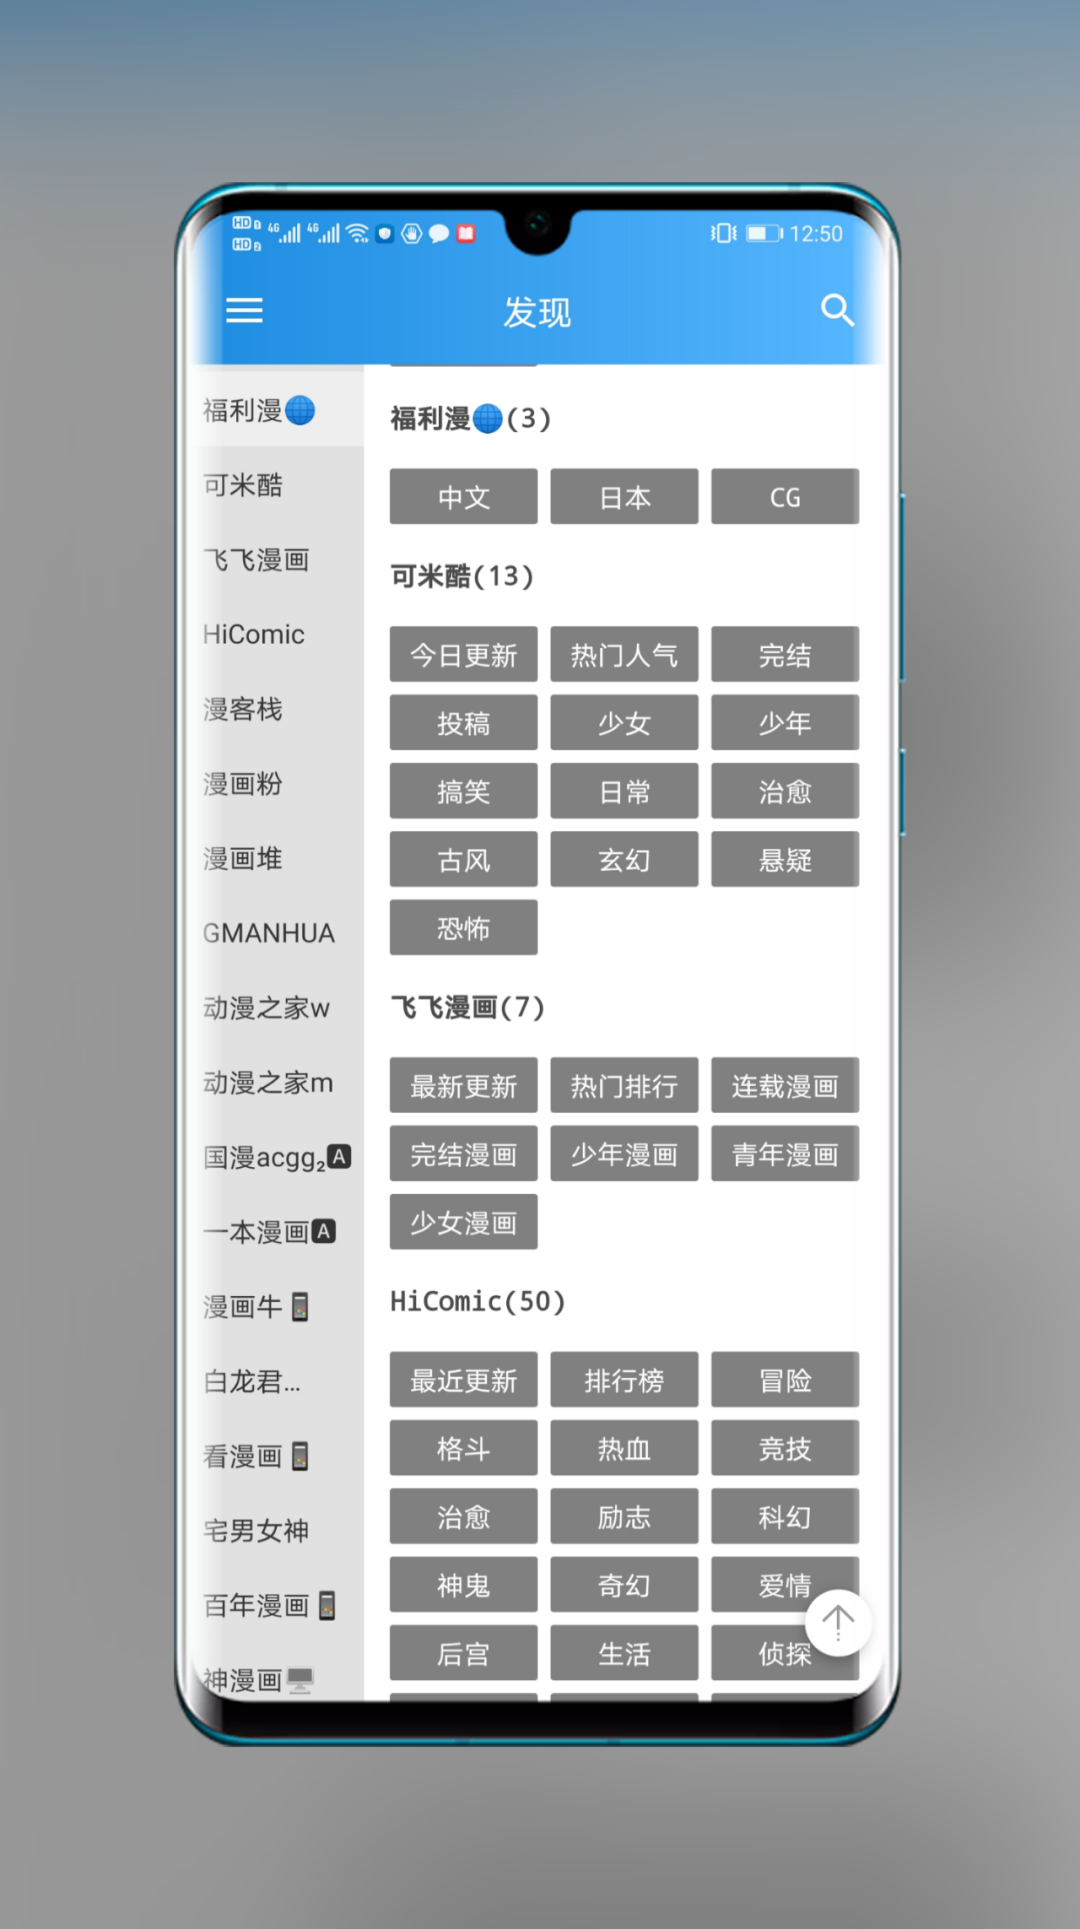 5f817ad01cd1bbb86b0c027d 宝藏网站就是-源仓库